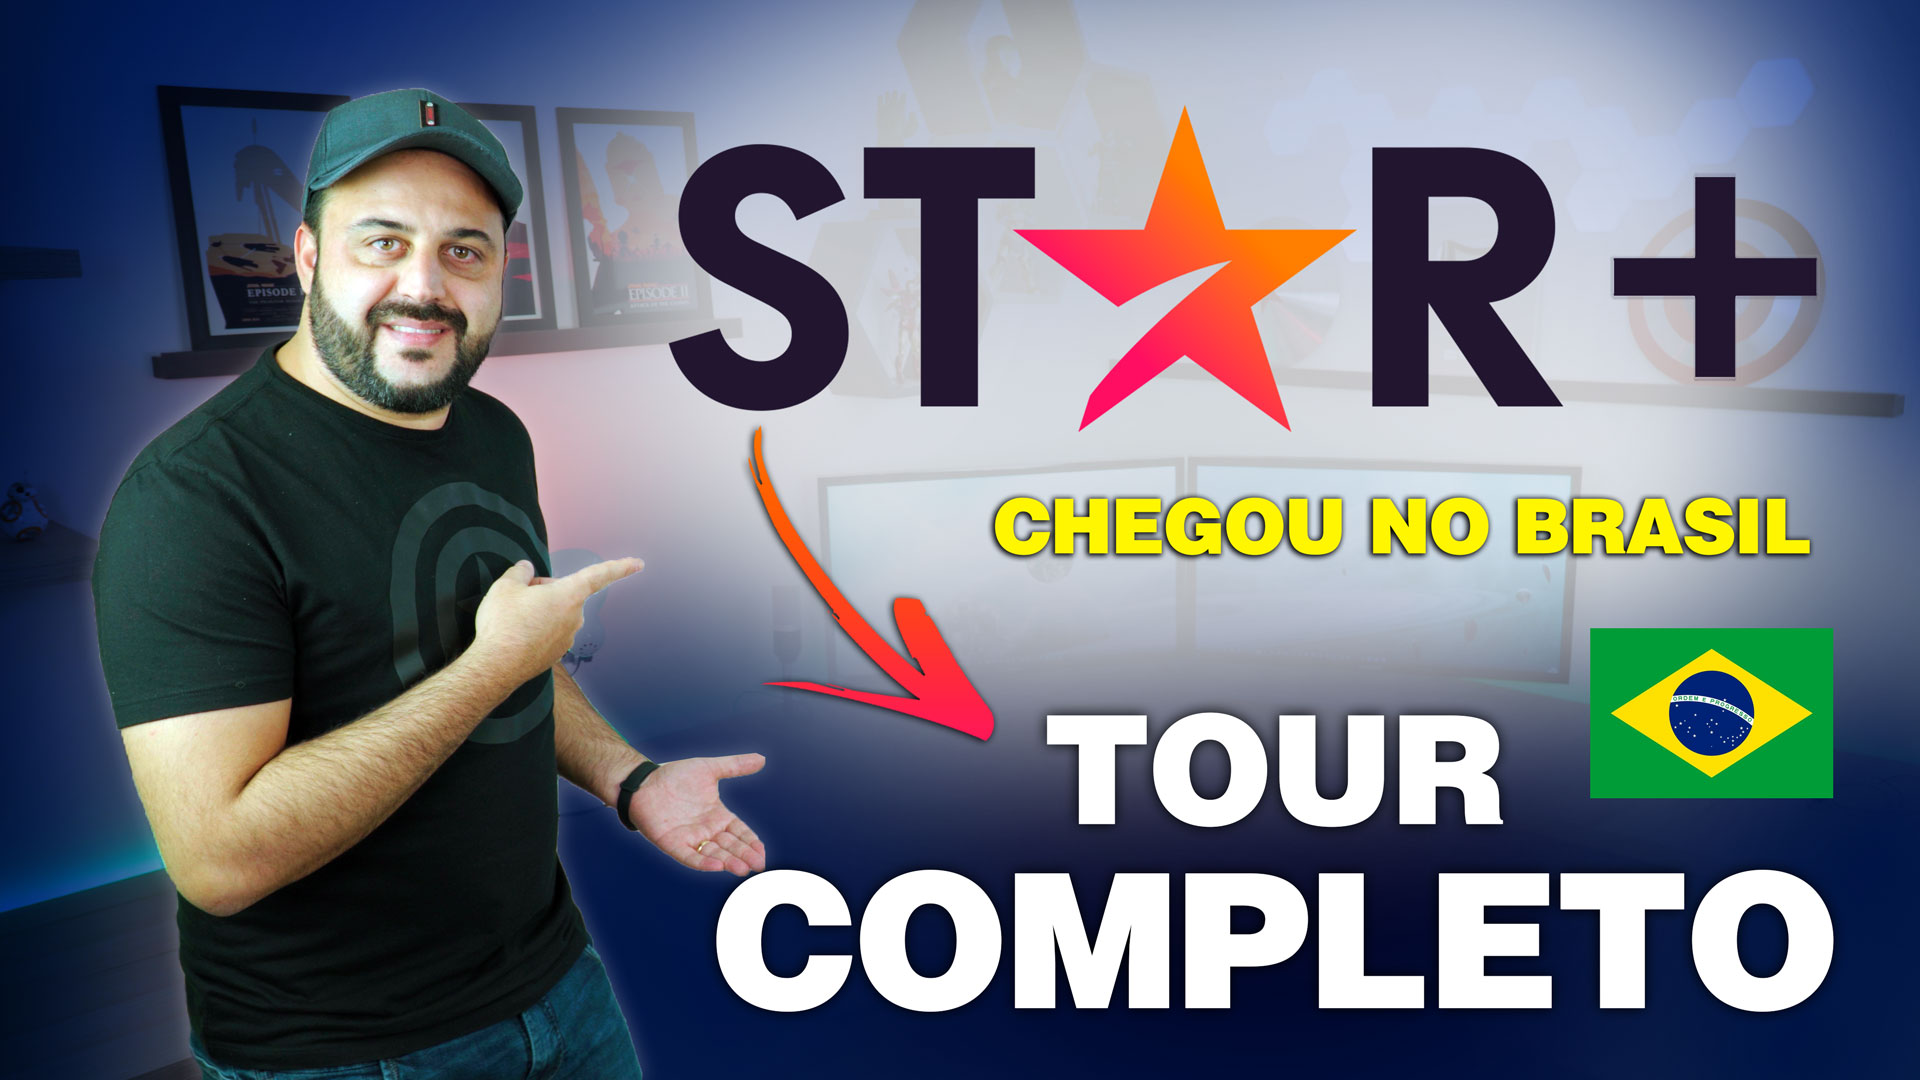 STAR-PLUS-TOUR-COMPLETO